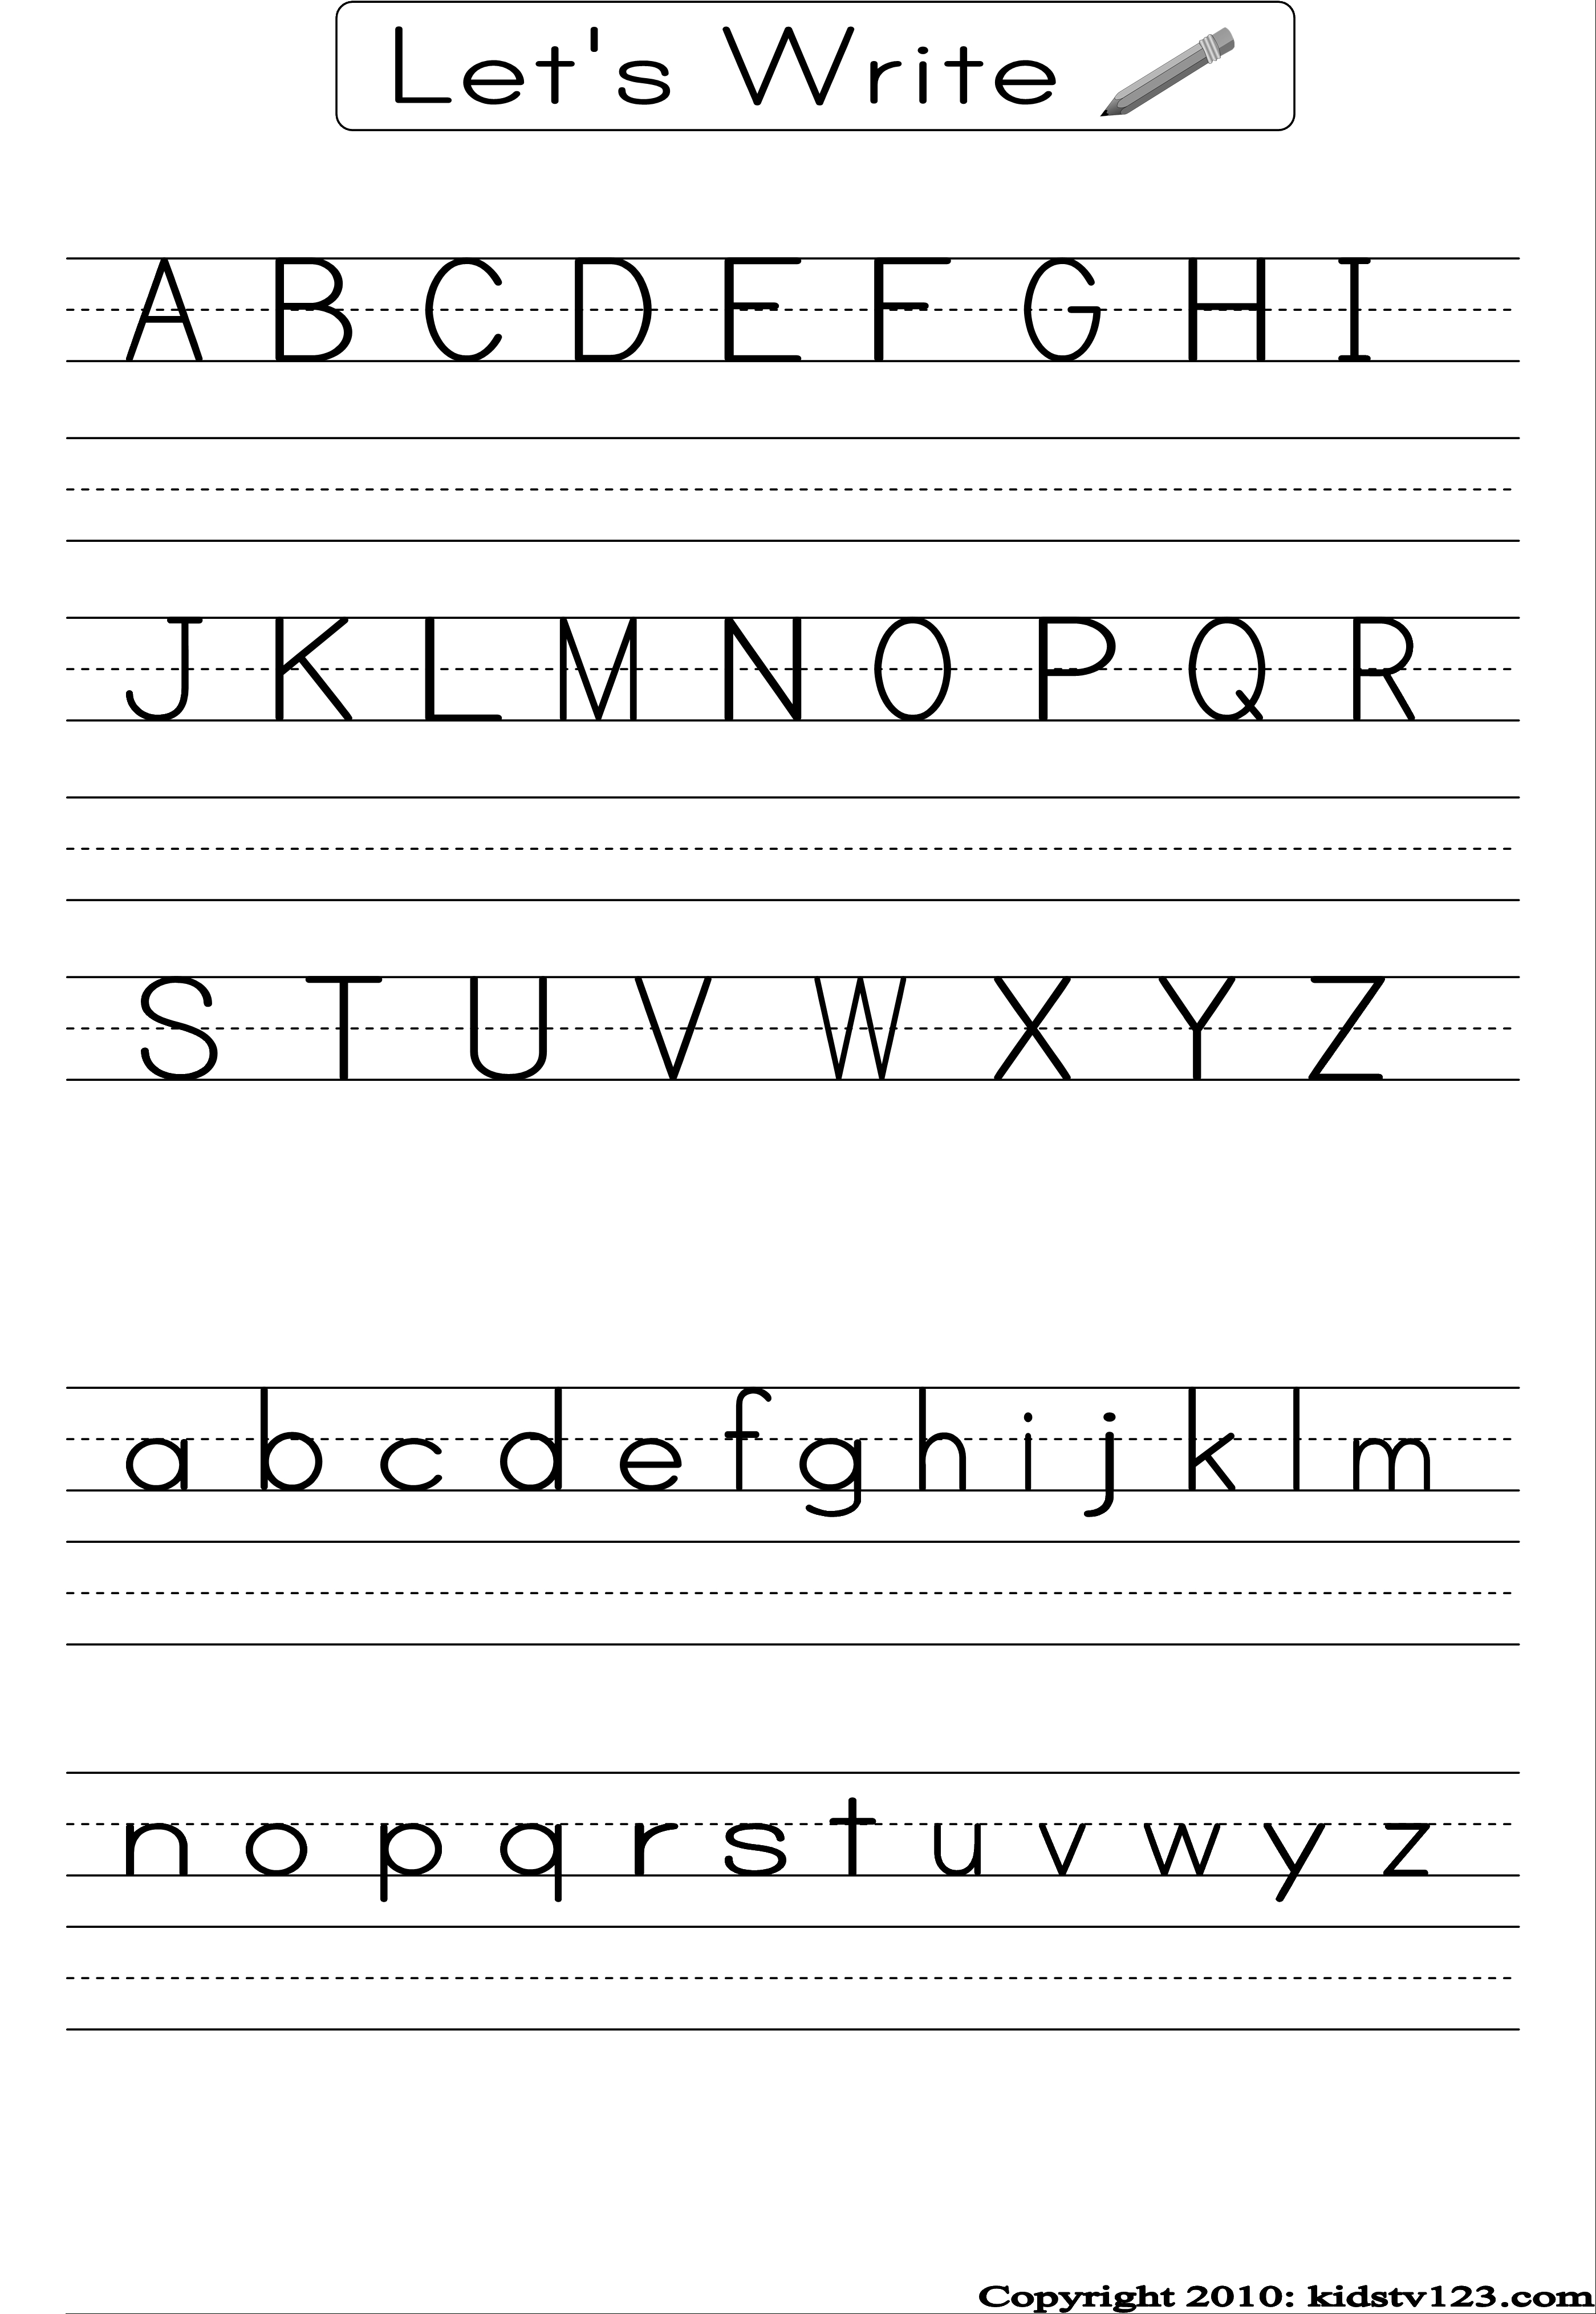 Alphabet Writing Practice Sheet | Edu-Fun | Alphabet Worksheets - Free Printable Handwriting Sheets For Kindergarten